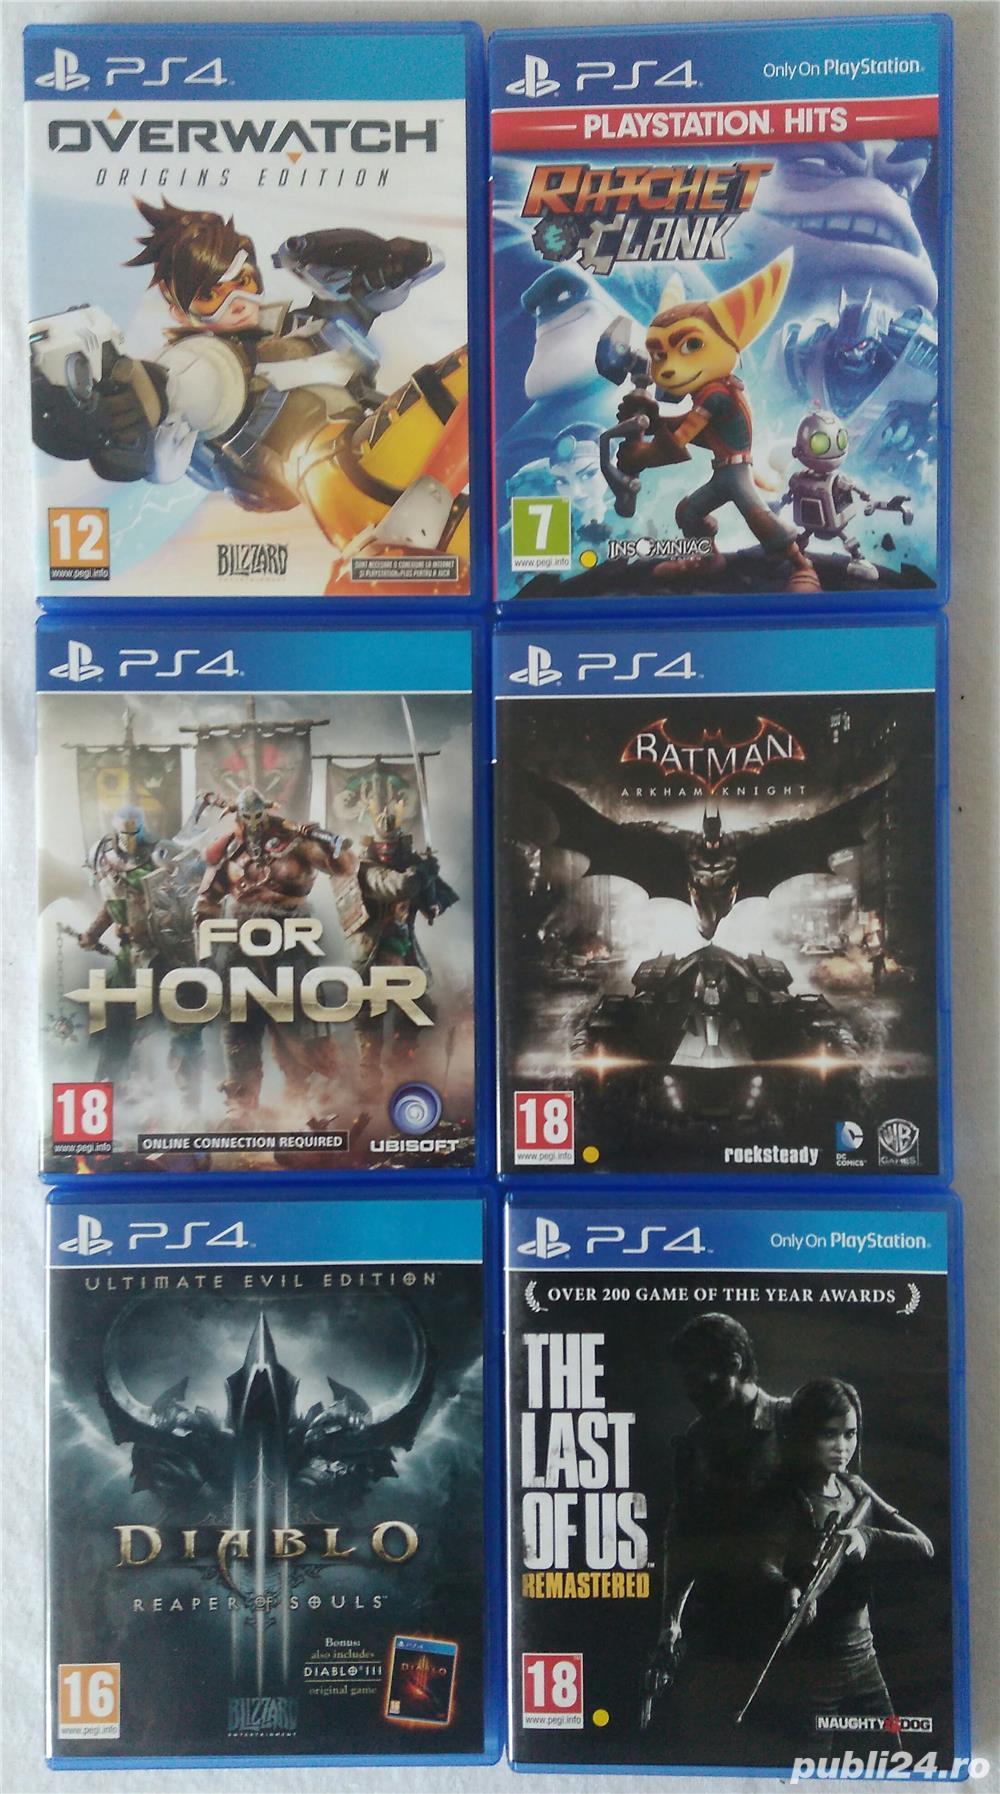 Jocuri PS4: Crew2, Spiderman, Homefront, Inpatient etc.